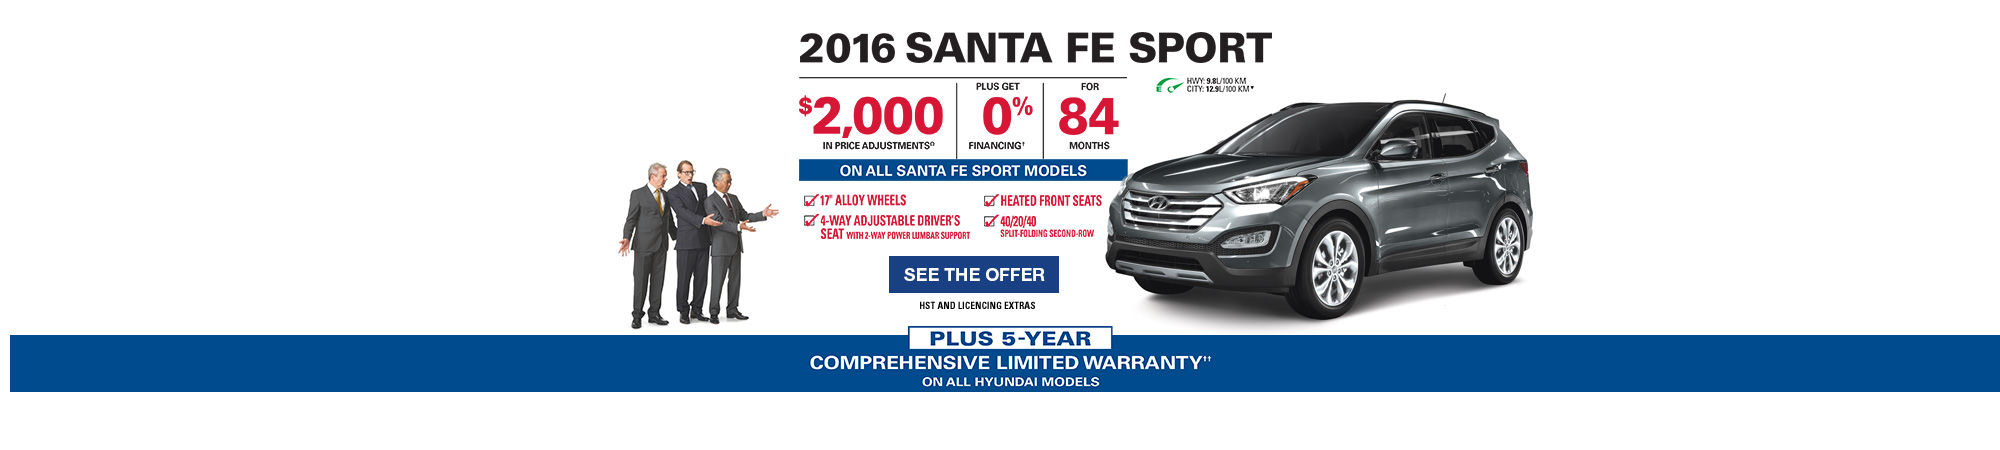 The Hyundai Advantage - santafe